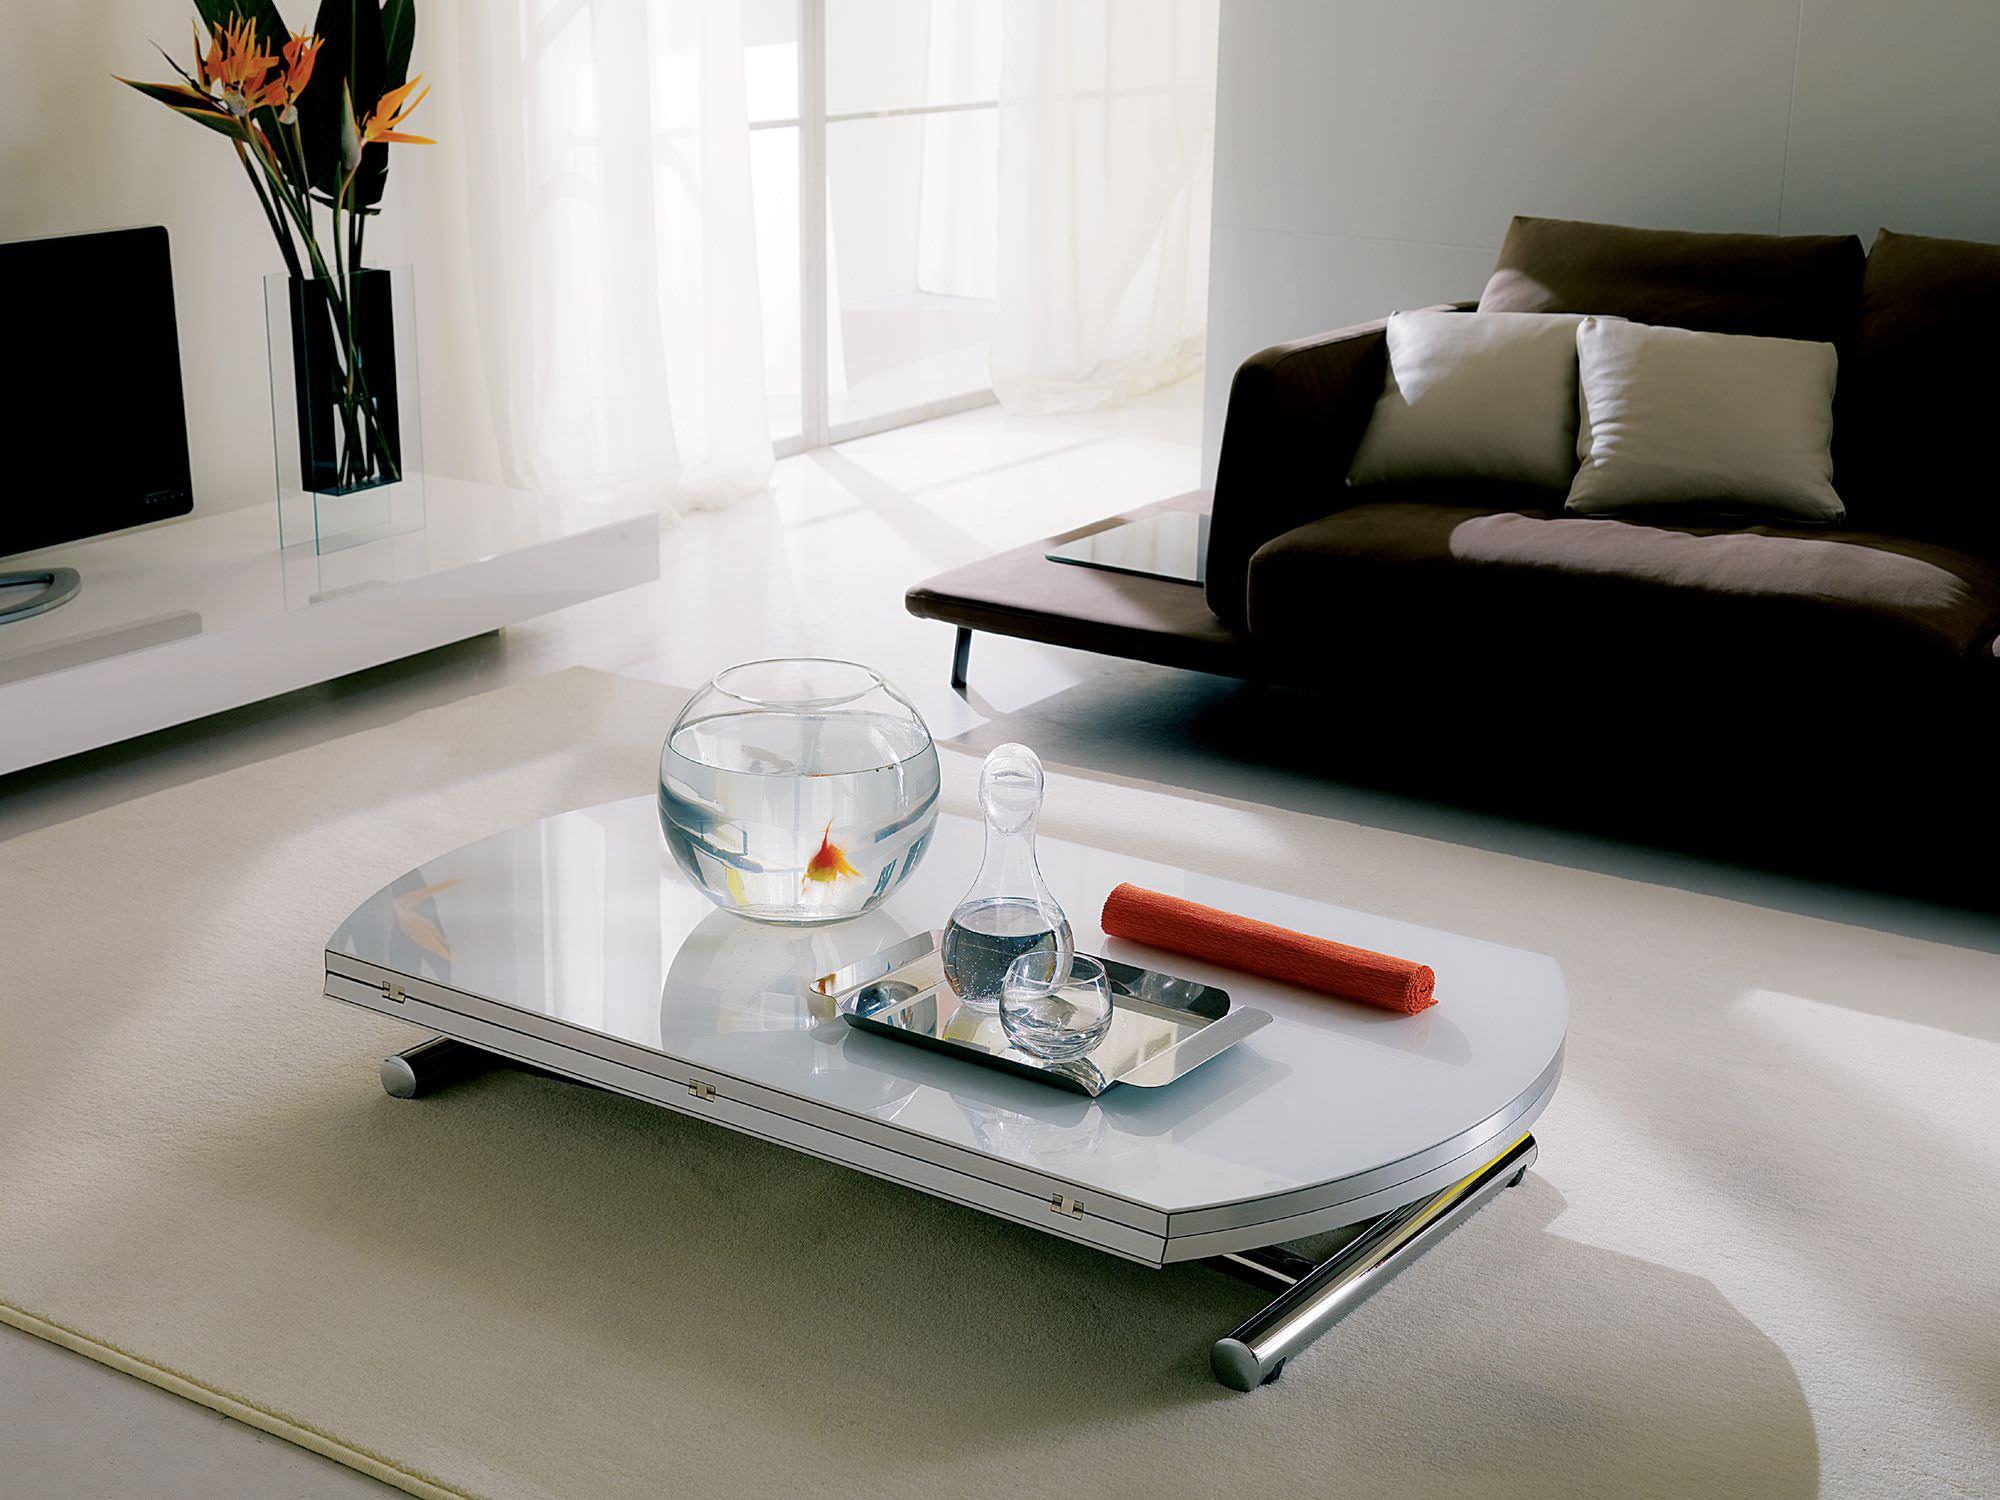 table ajustable en hauteur avec rallonge - Table Reglable En Hauteur Avec Rallonge